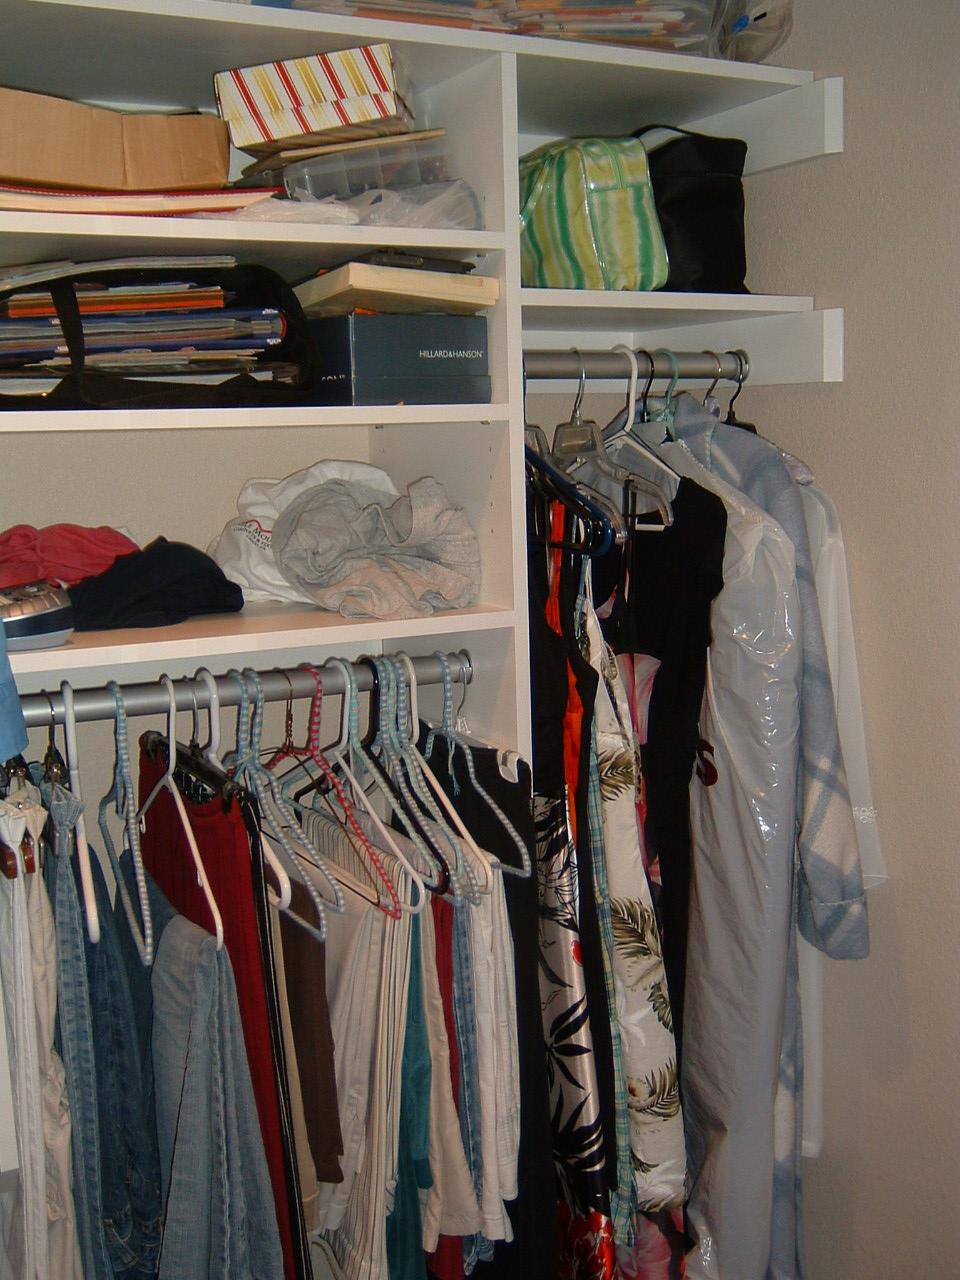 6-Nazaretta Closet .JPG